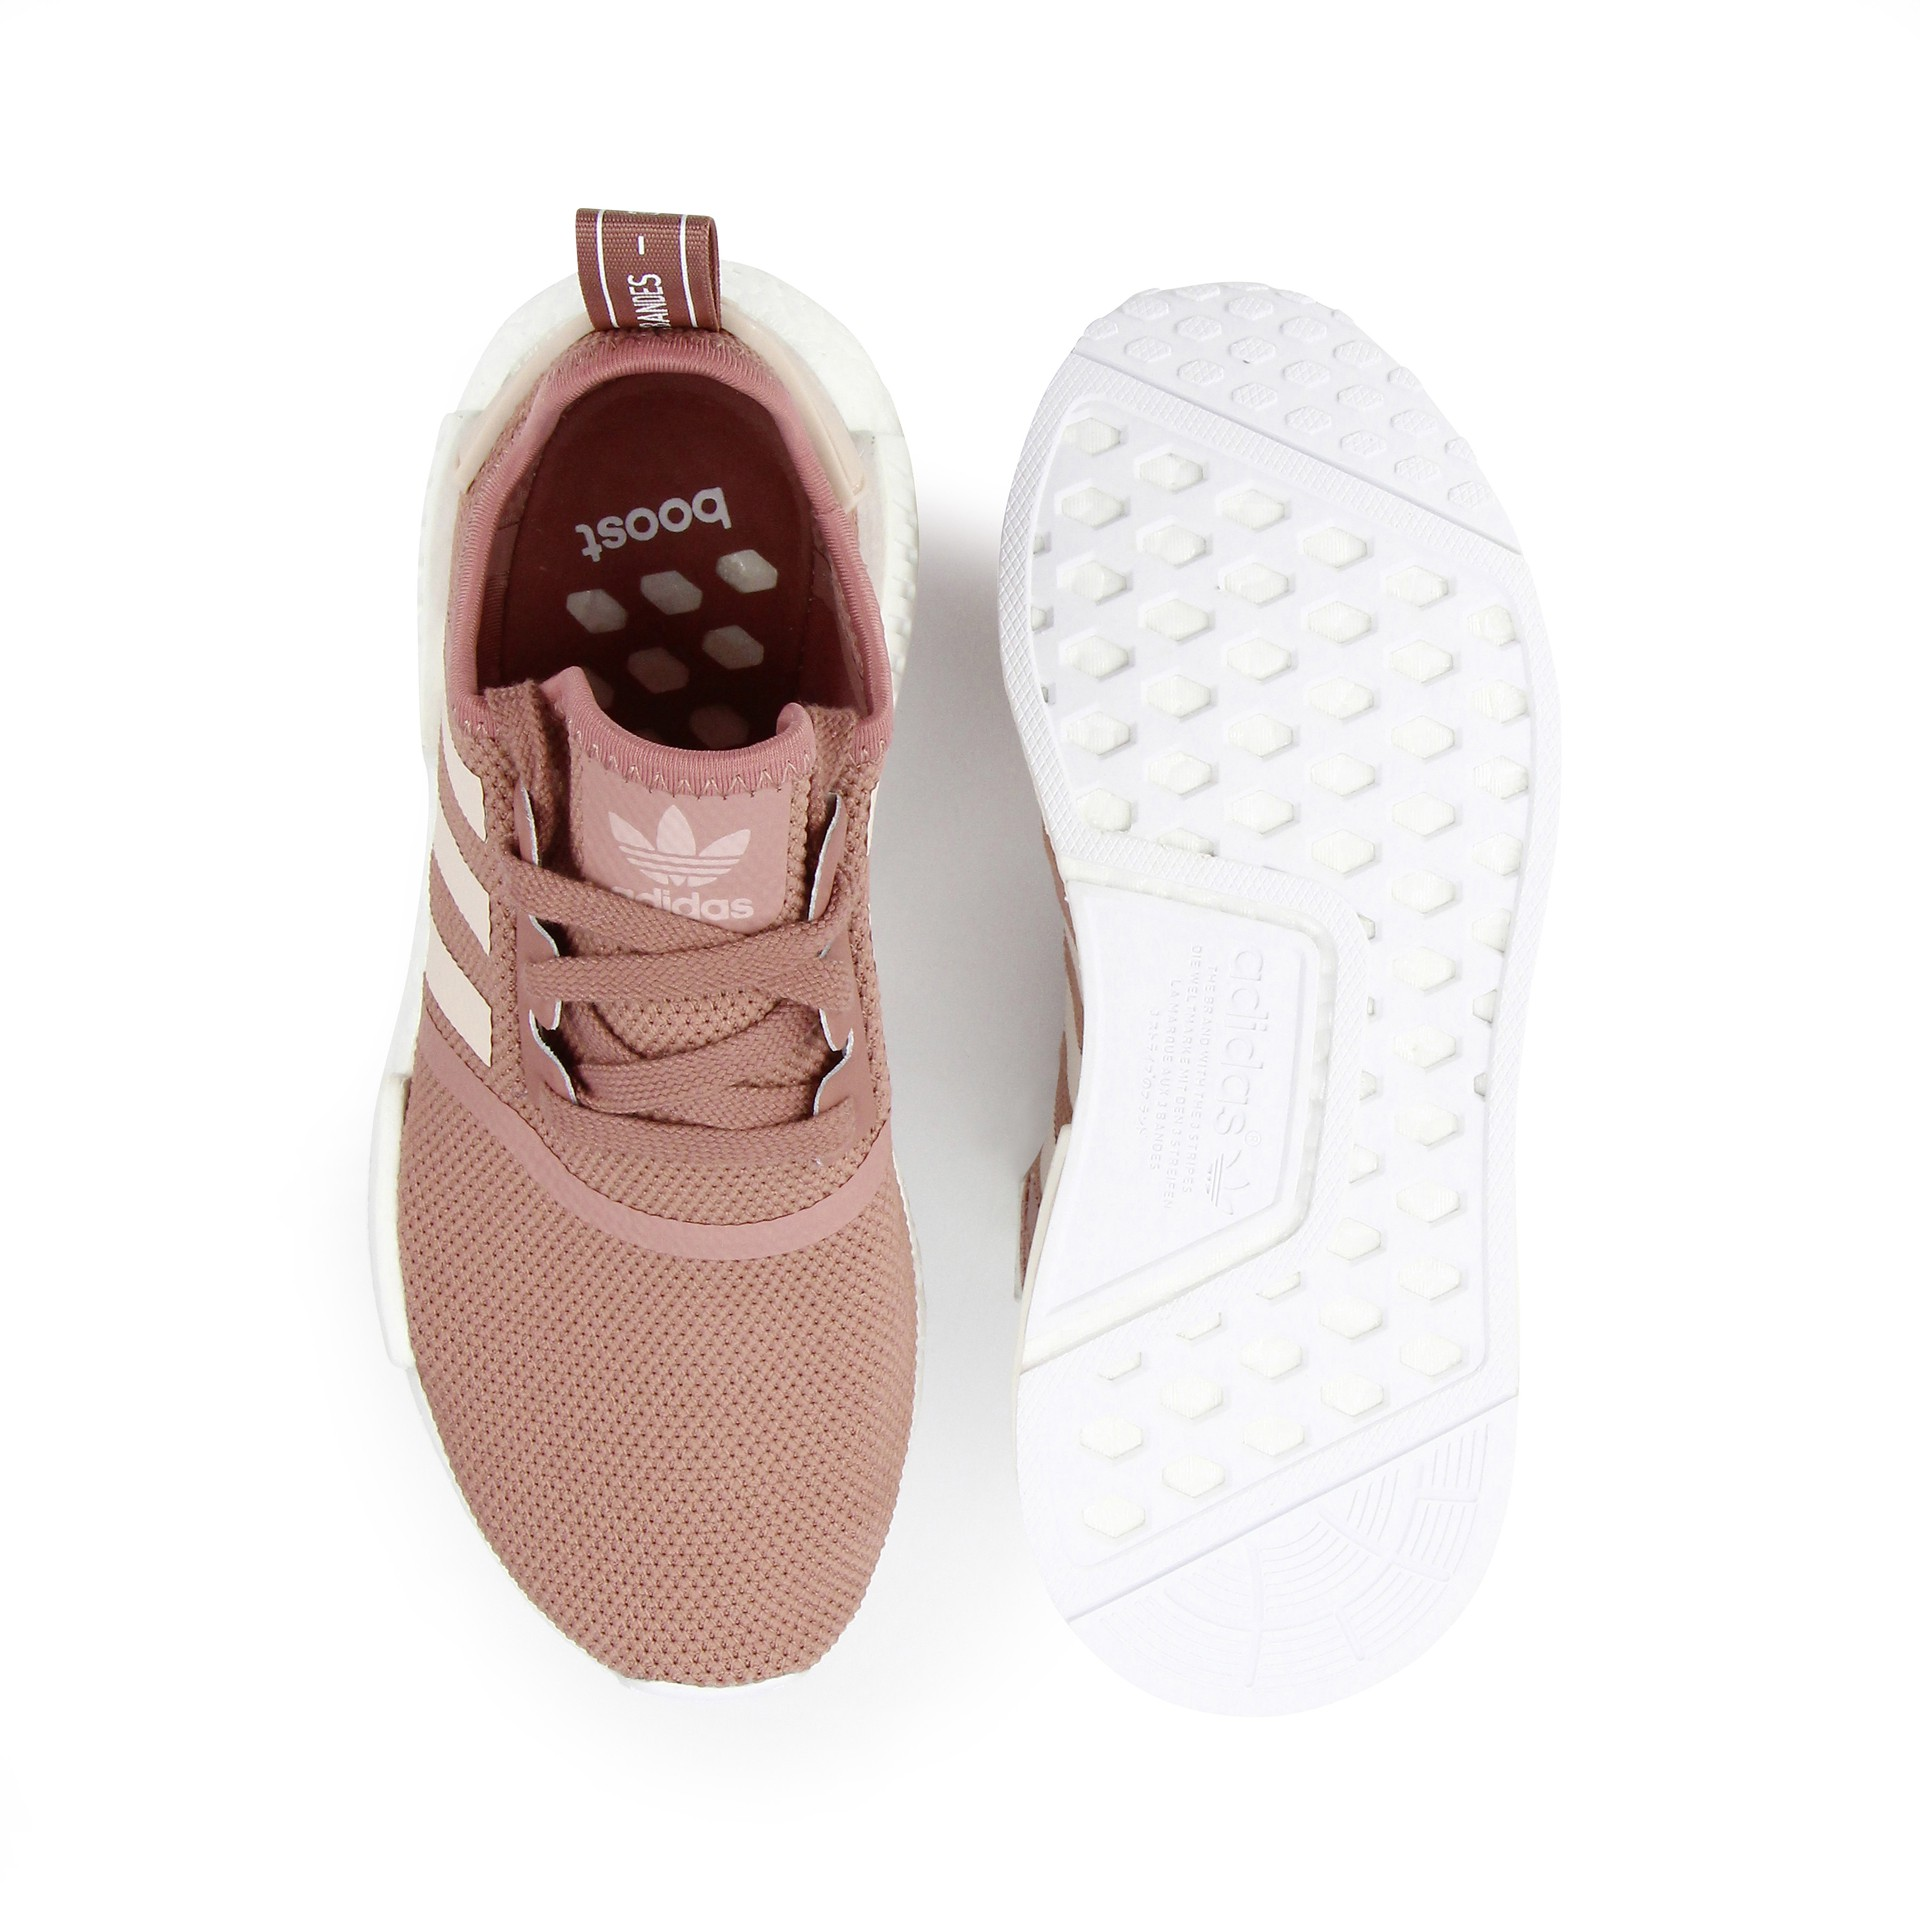 basket adidas femme 2017,Baskets Adidas LOS ANGELES Femme